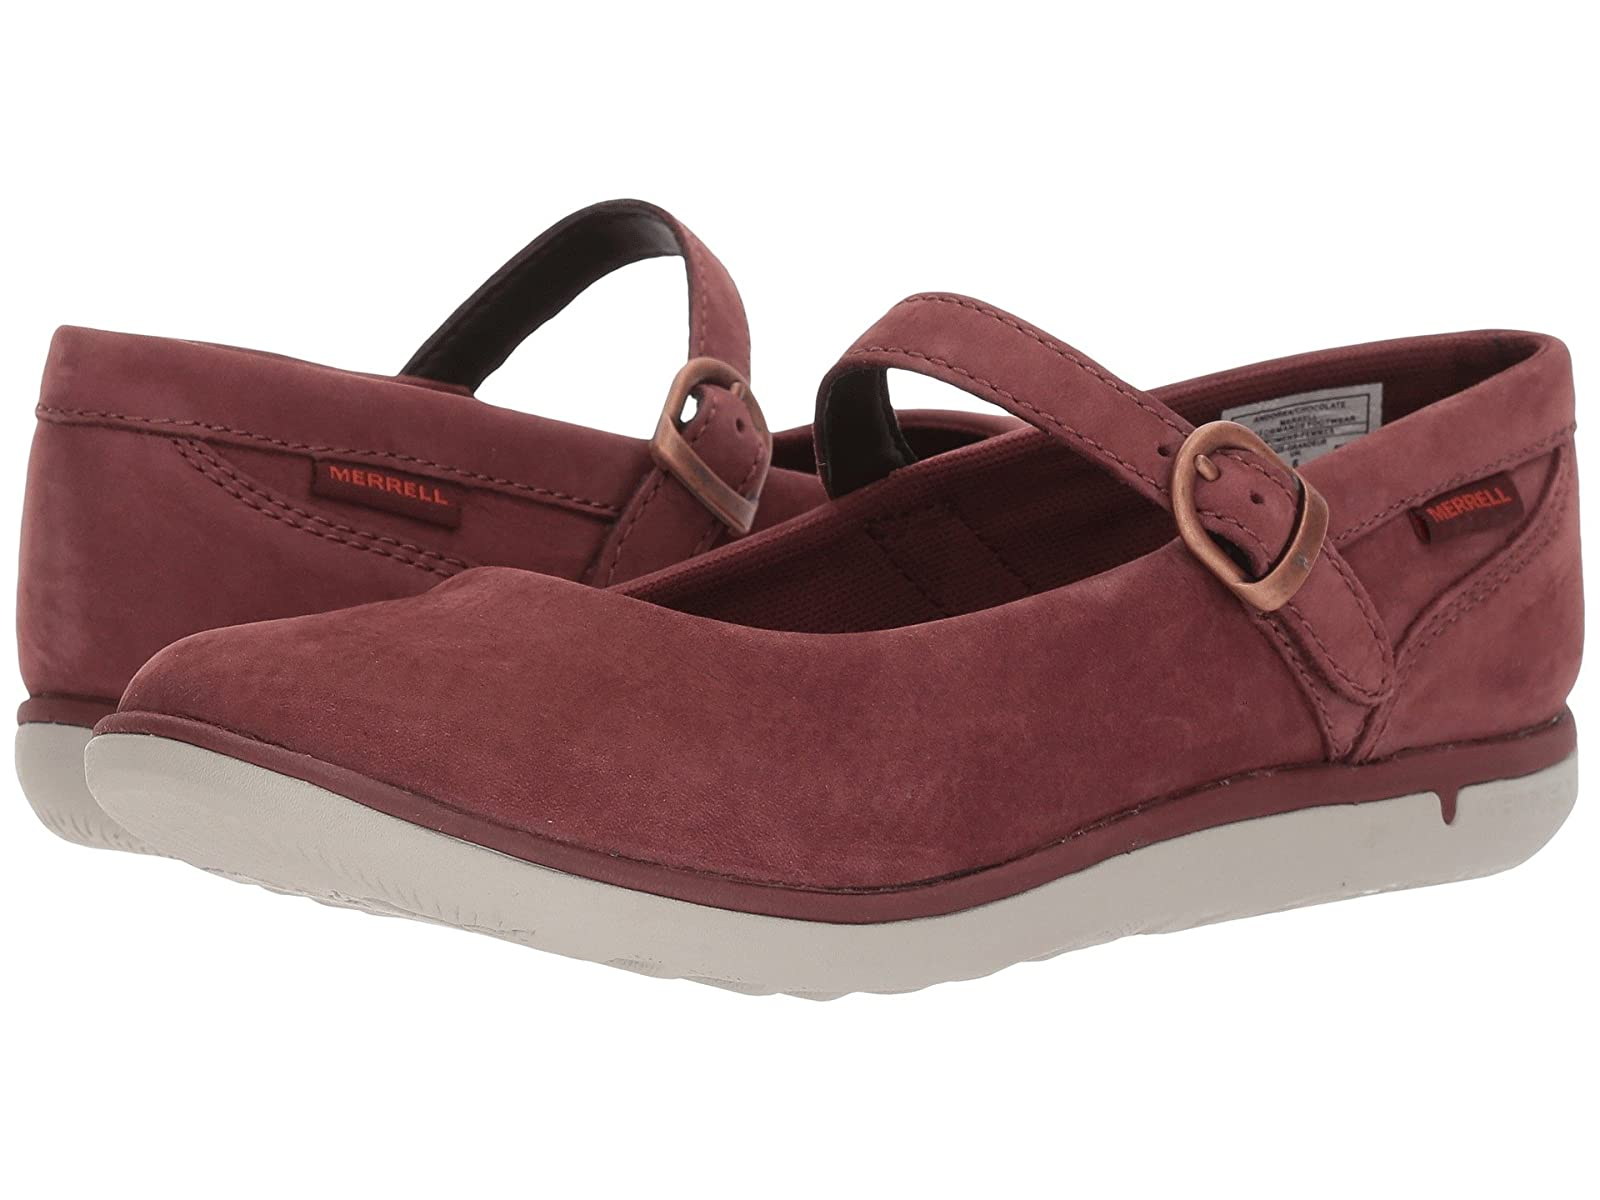 Merrell Duskair Maui MJ LeatherCheap and distinctive eye-catching shoes